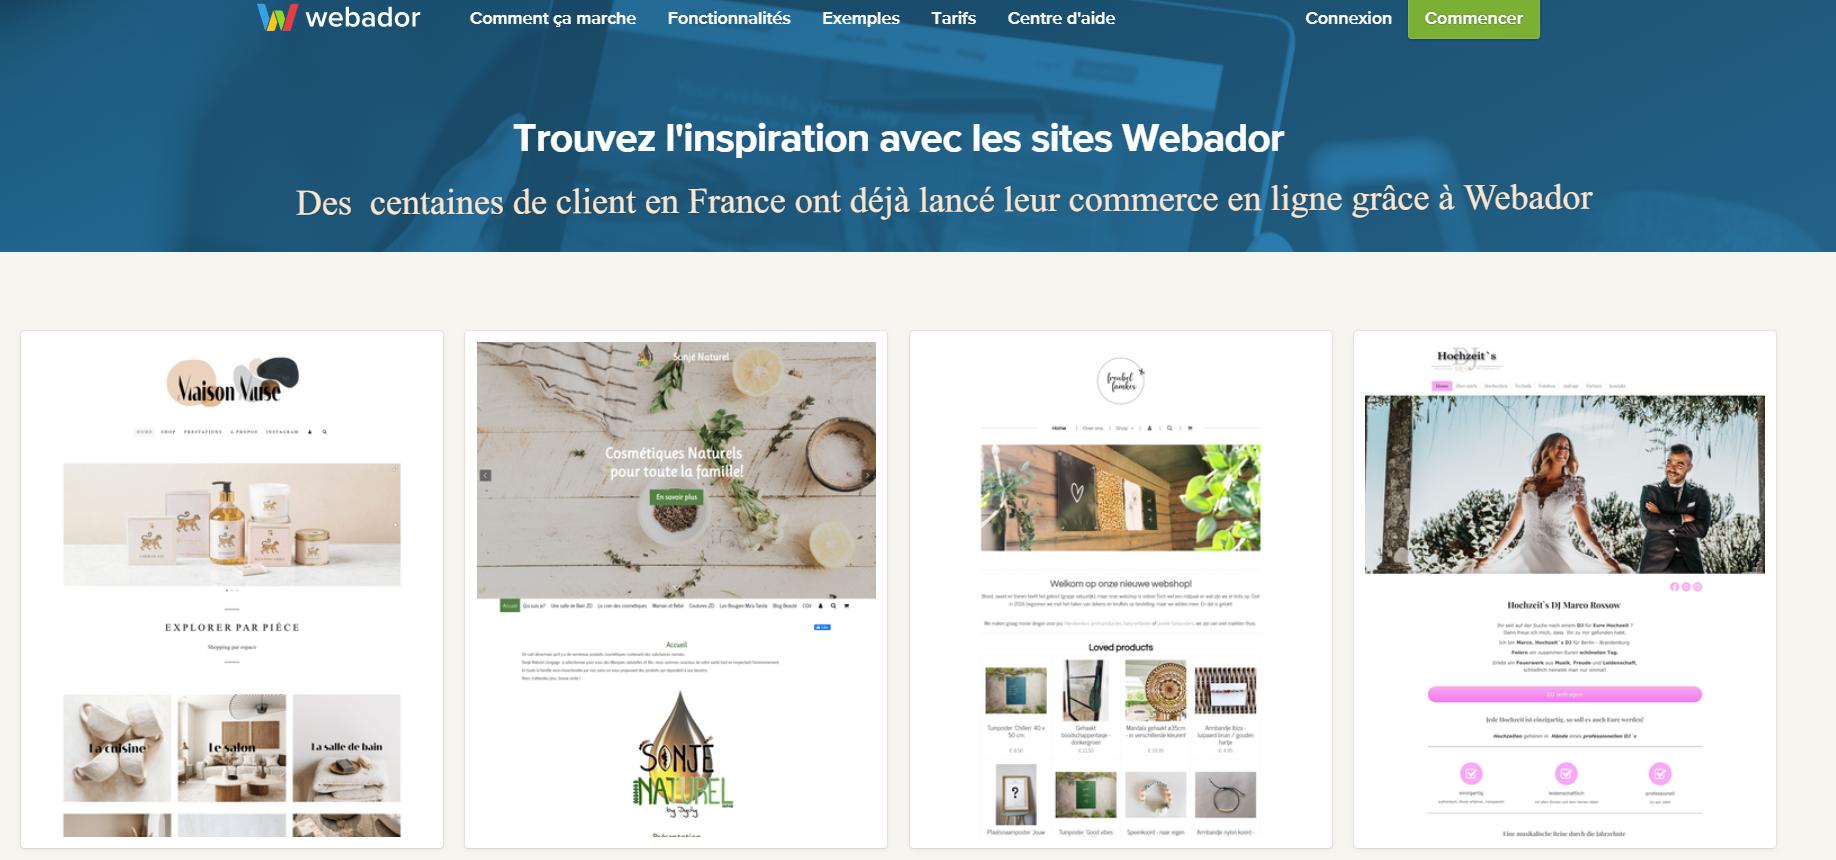 Les-sites-internet-créés-par-nos-clients-Webador-fr.png